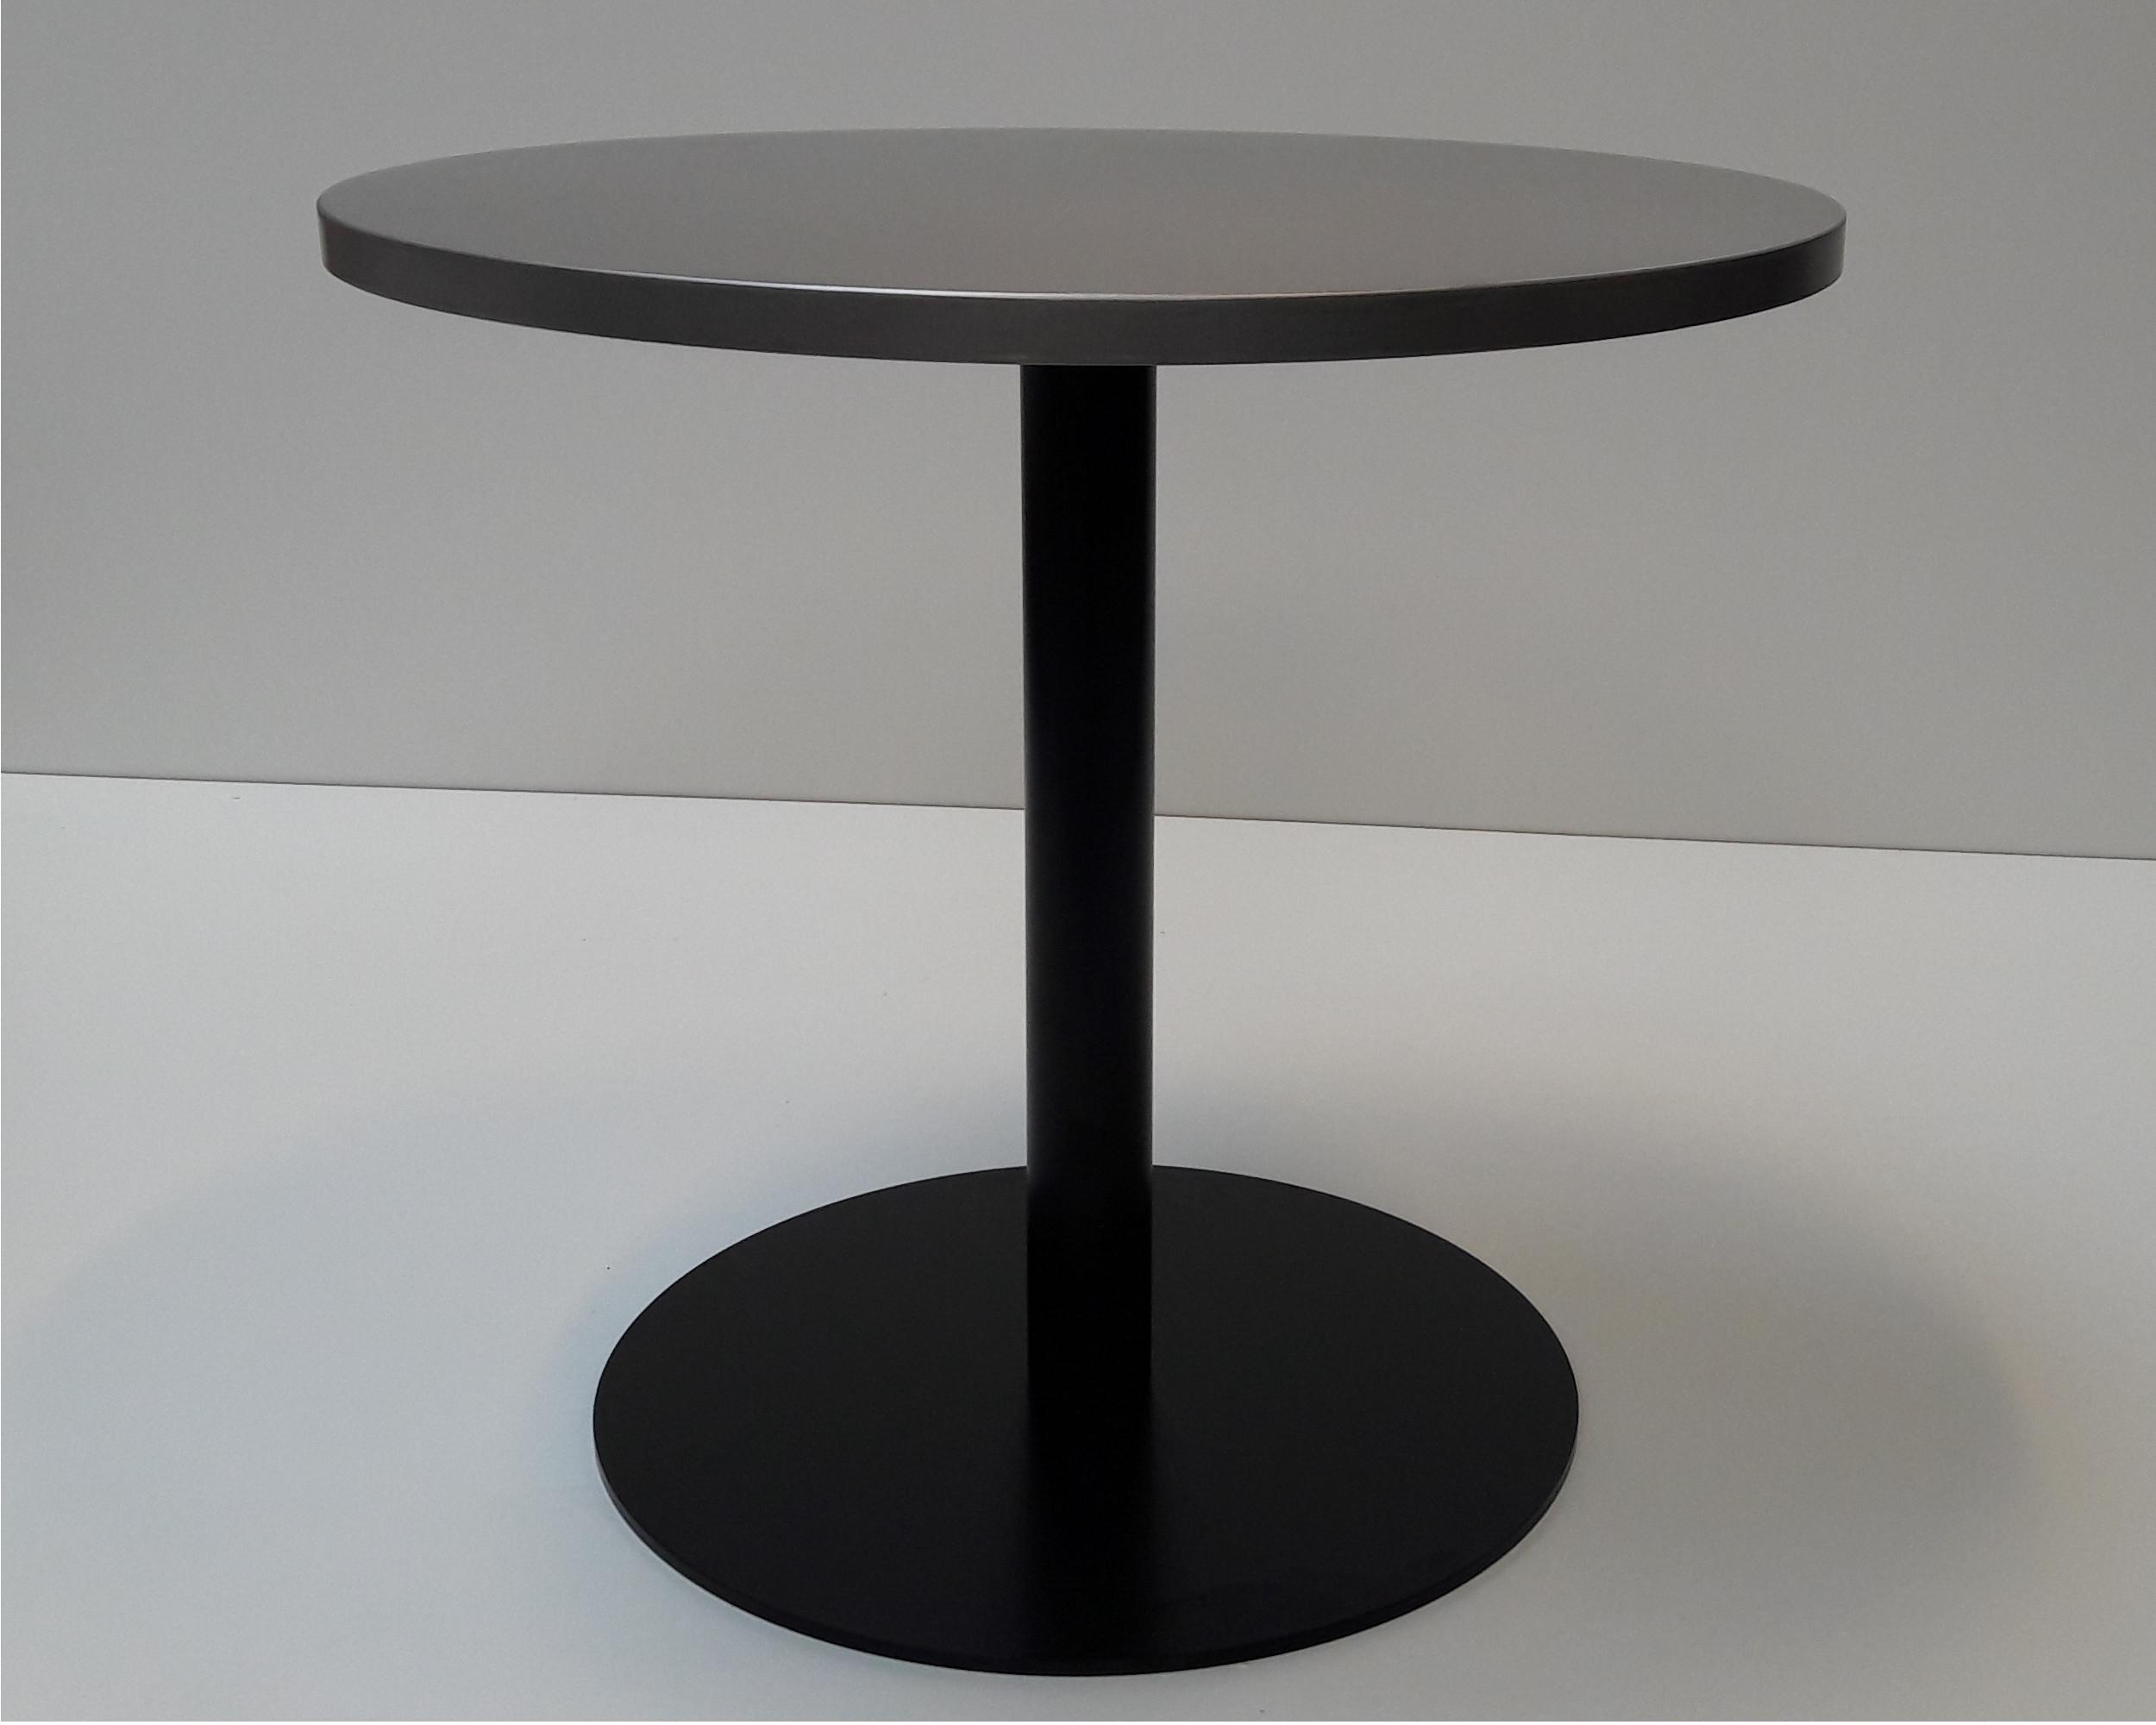 Café bord med curlet overflade på den rustfaste bordplade. Stel i sortmalet stål.